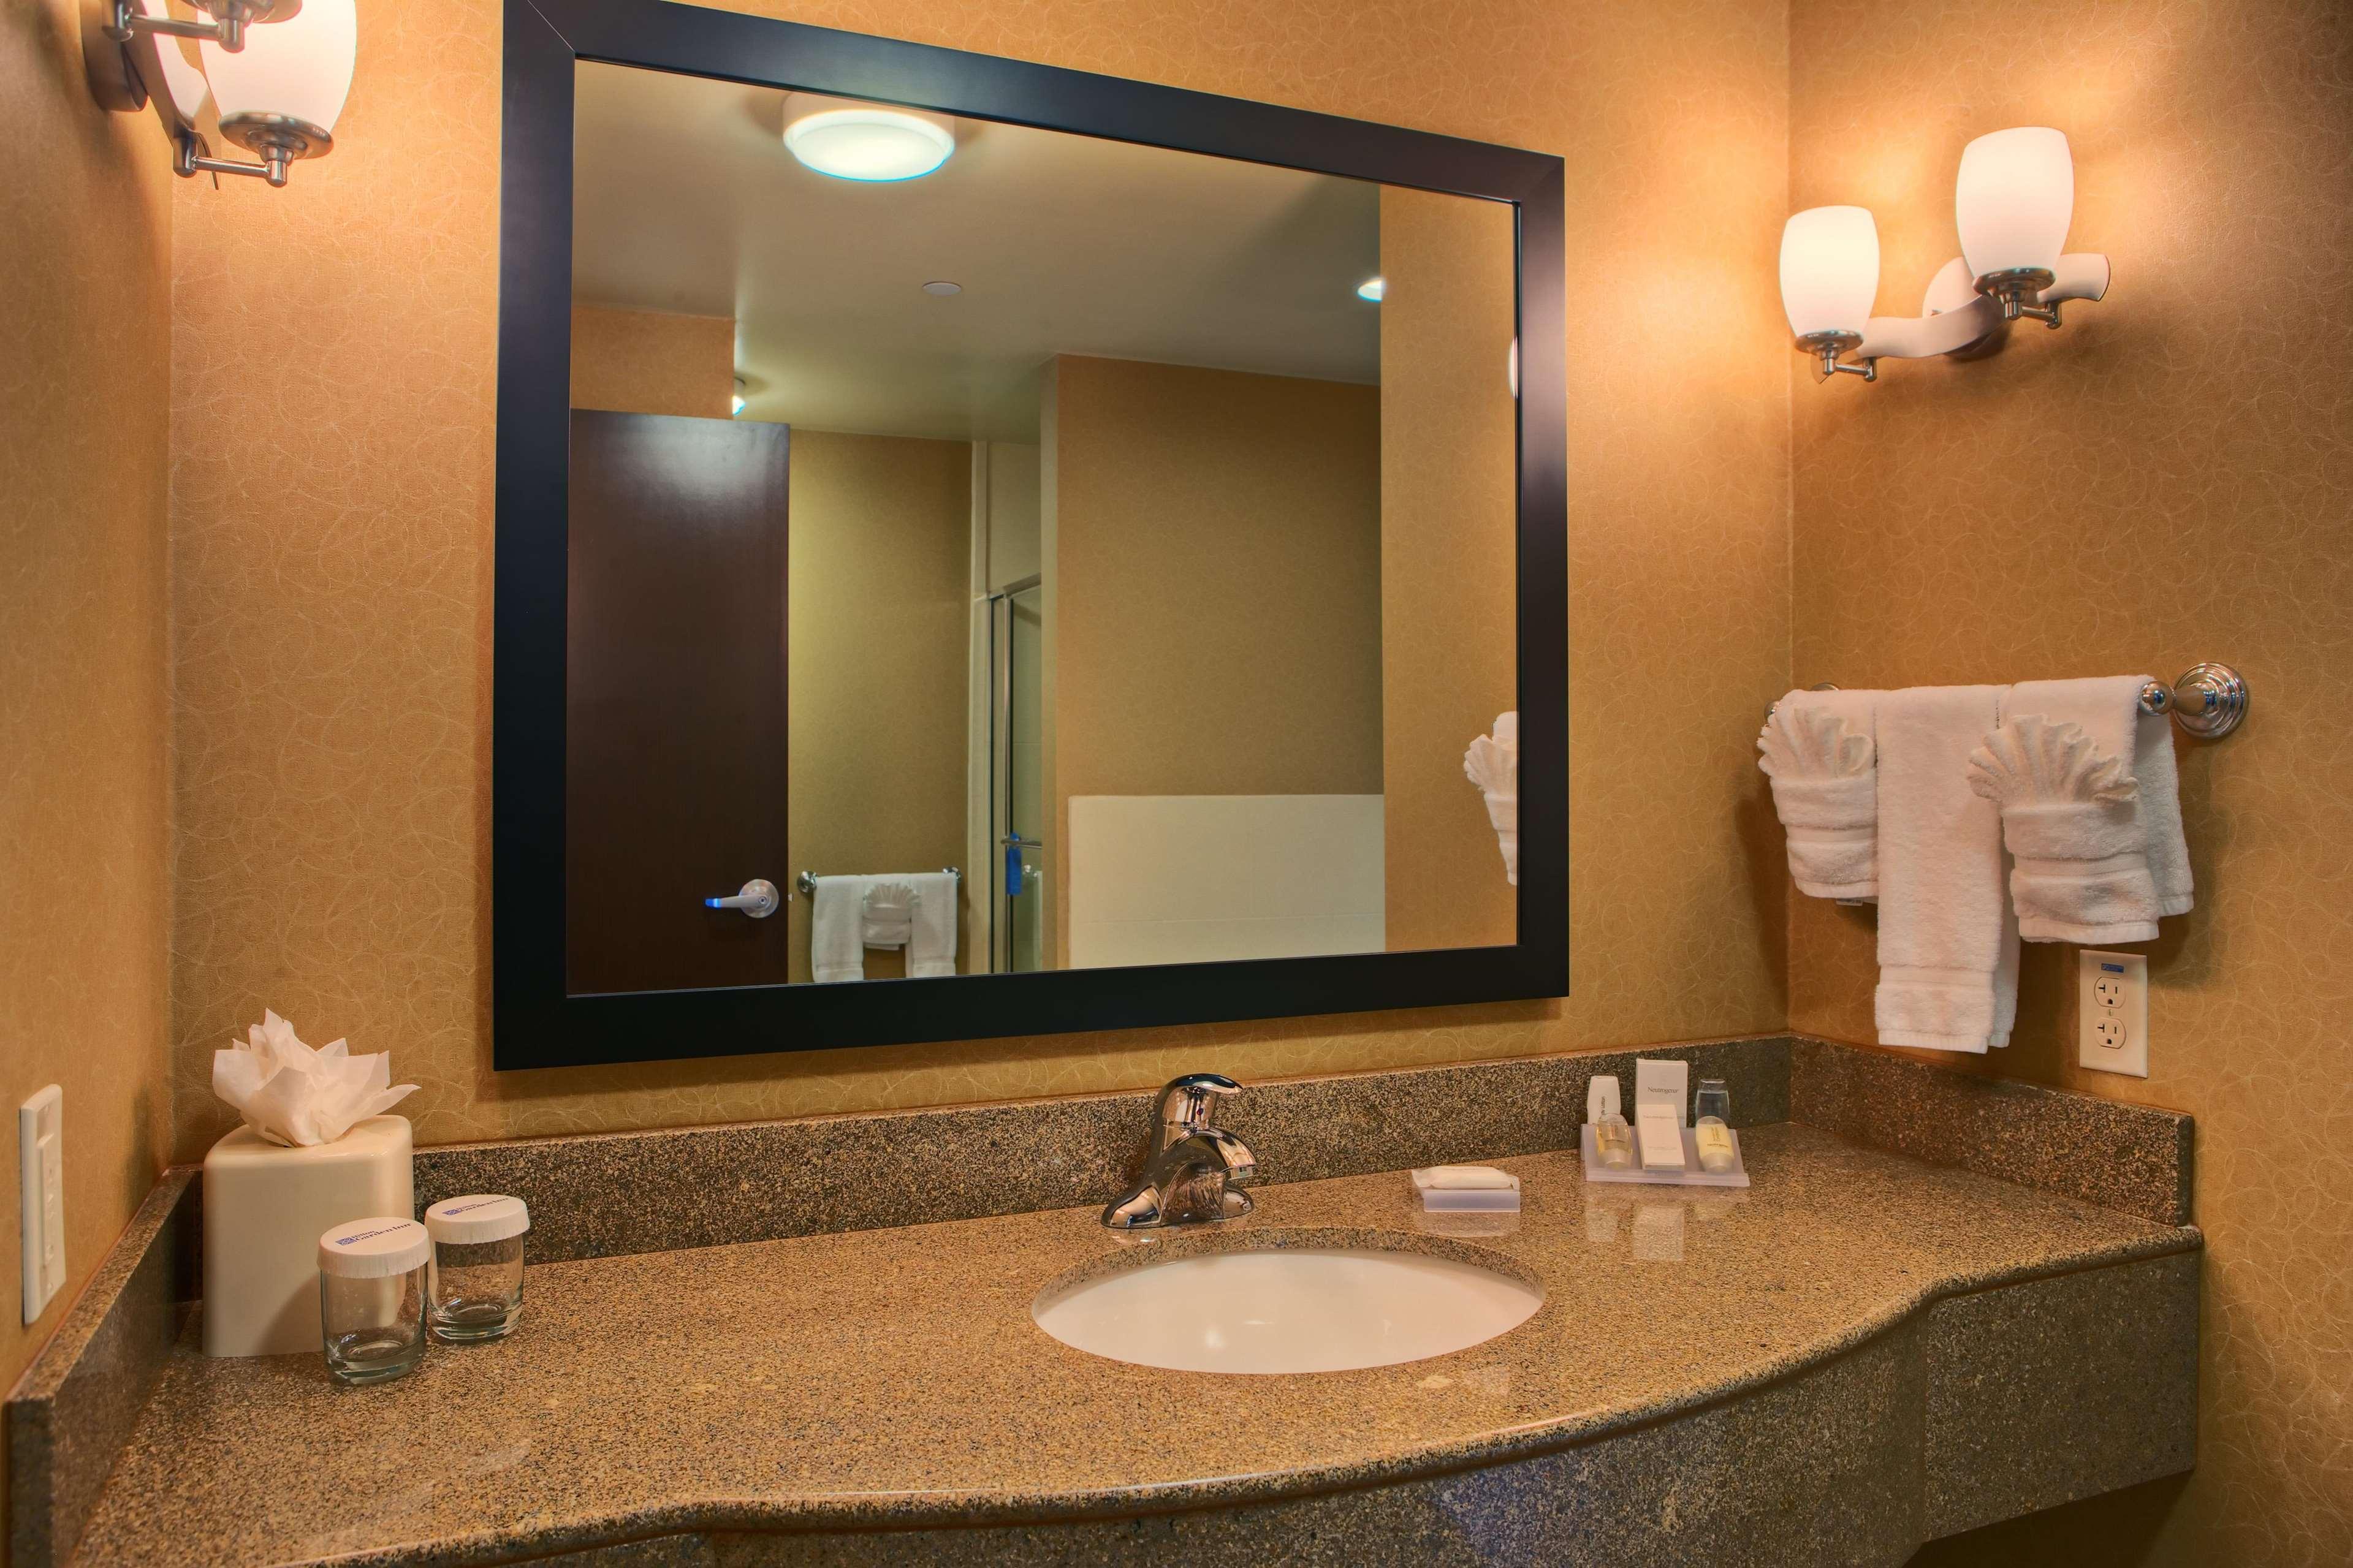 Hilton Garden Inn DFW North Grapevine image 20